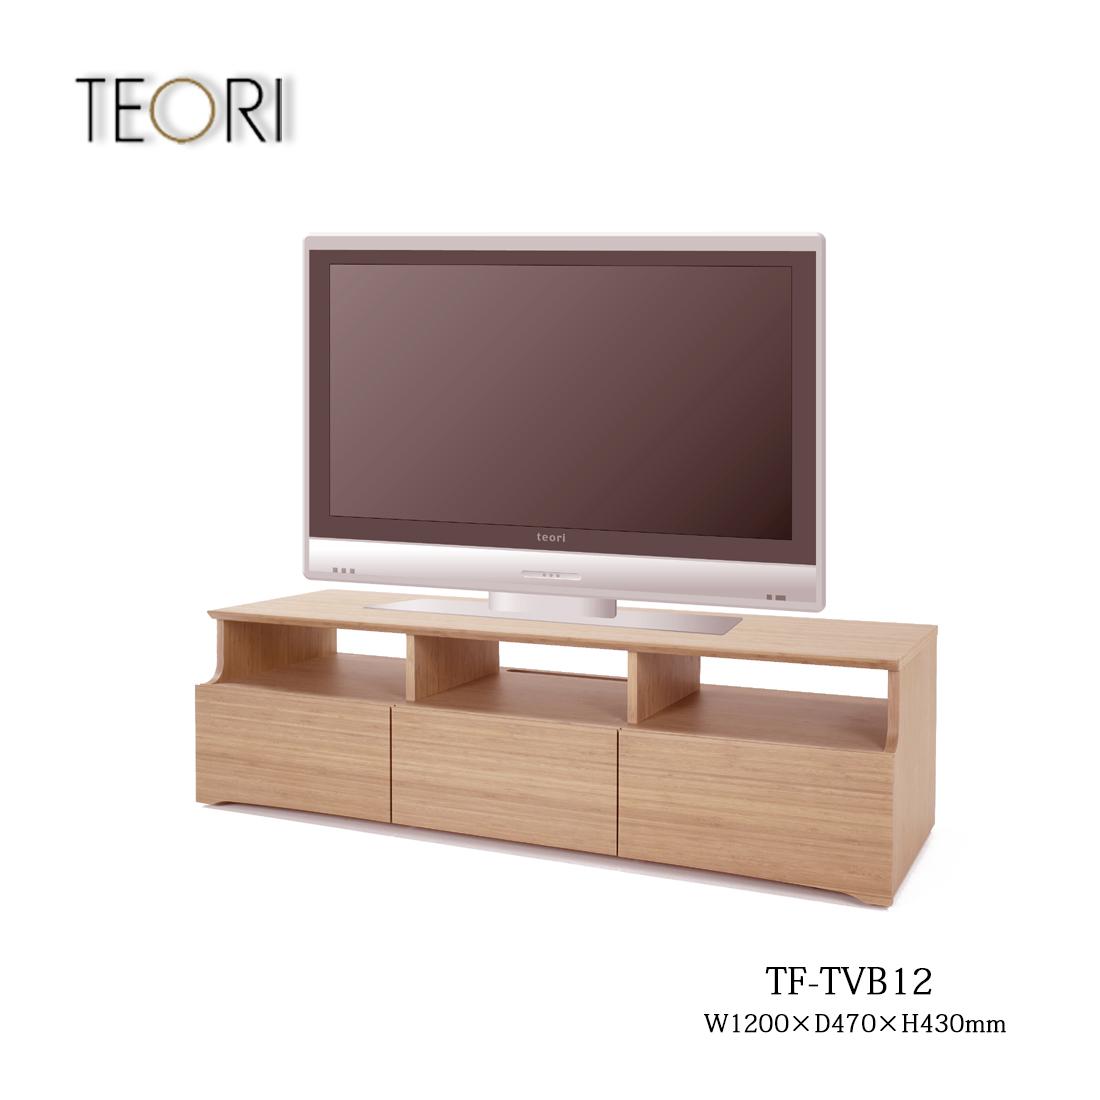 【TEORI テオリ】F TV BOARD テレビボード TF-TVB12 /テレビ台/W1200×D470×H430mm TVボード/竹無垢 日本製/岡山